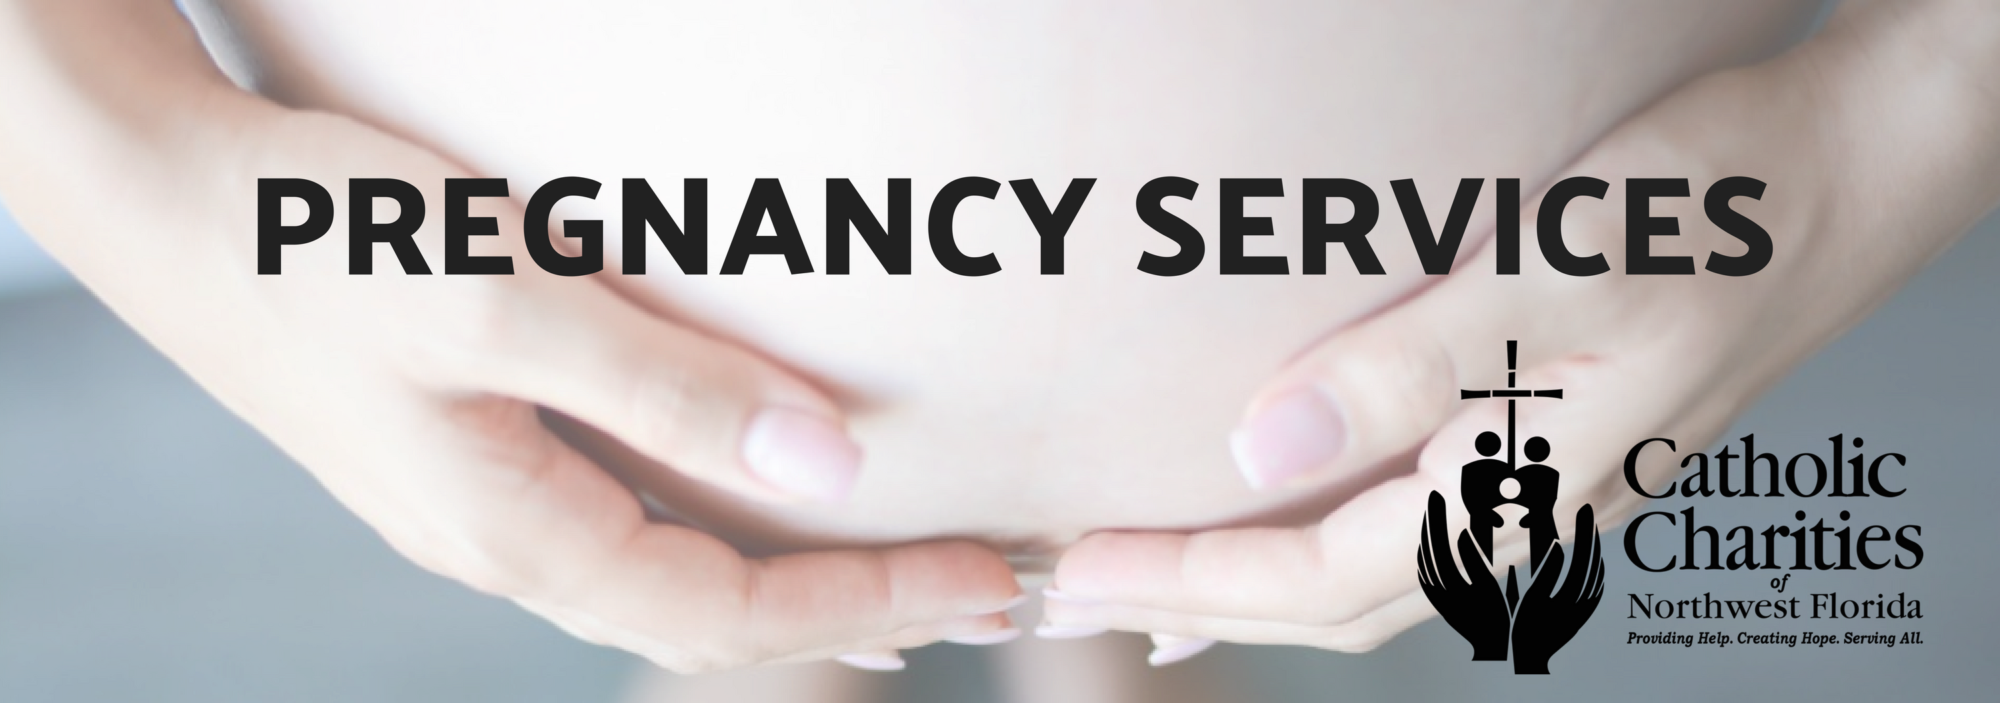 PregnancyHeader